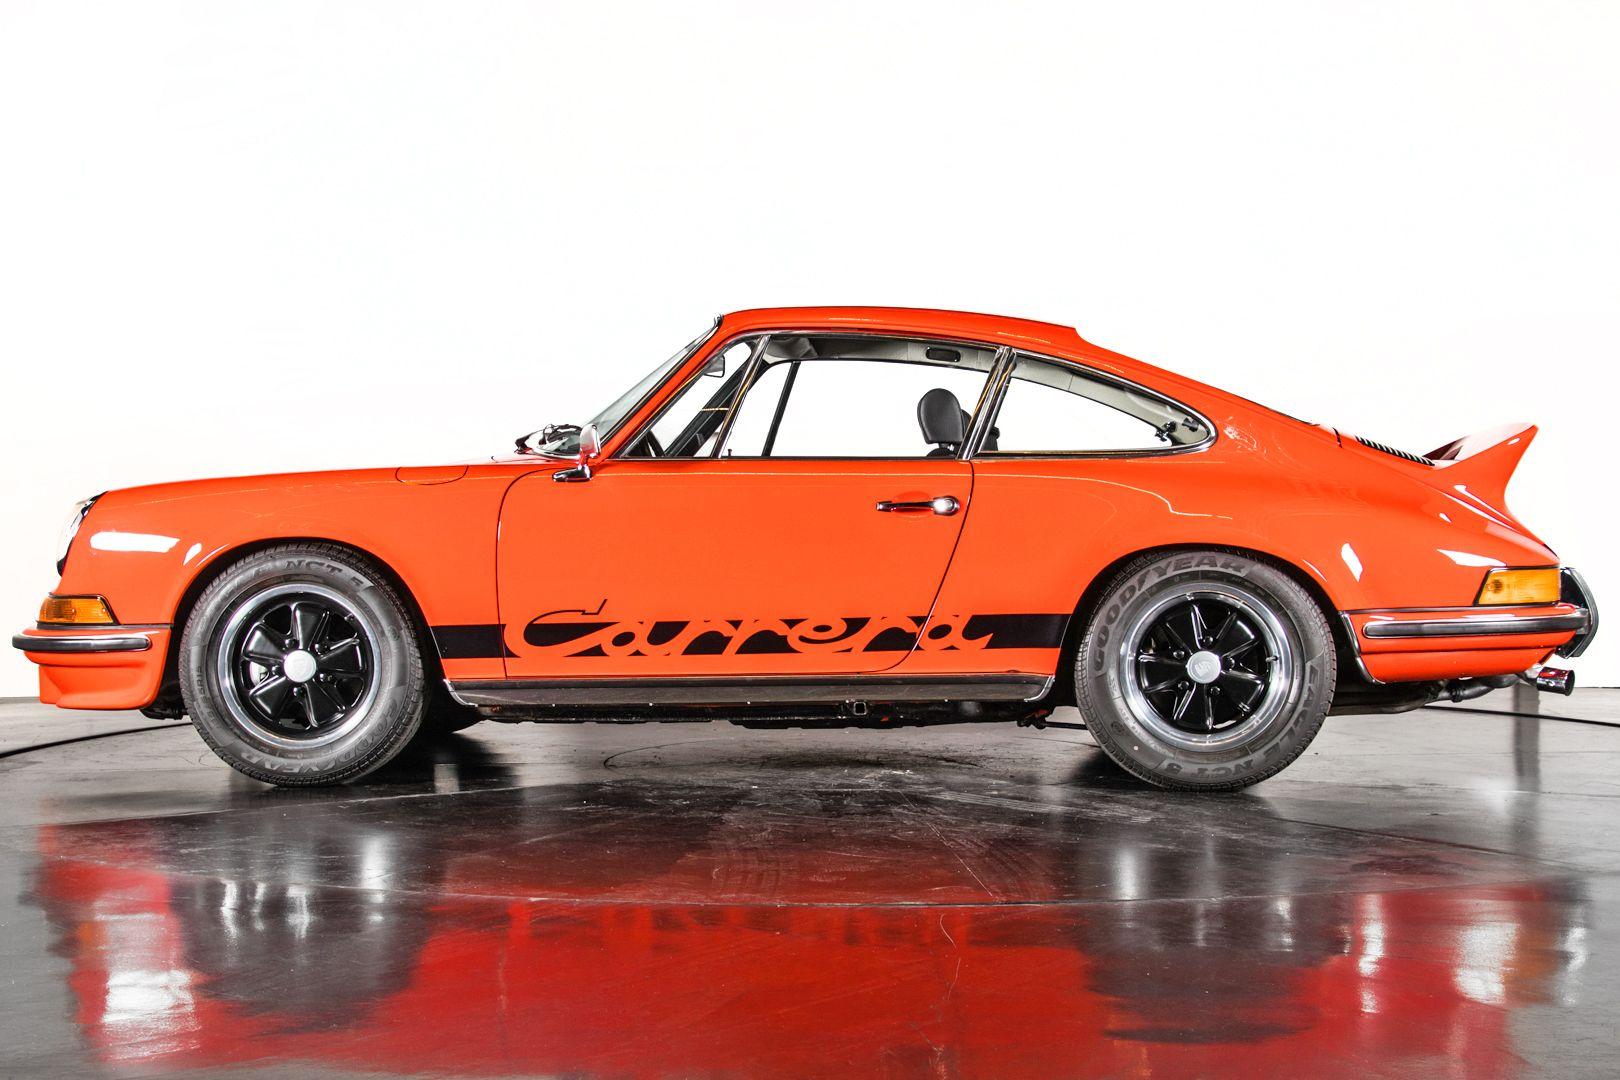 1973 Porsche 911 Carrera 2.7 RS 44393